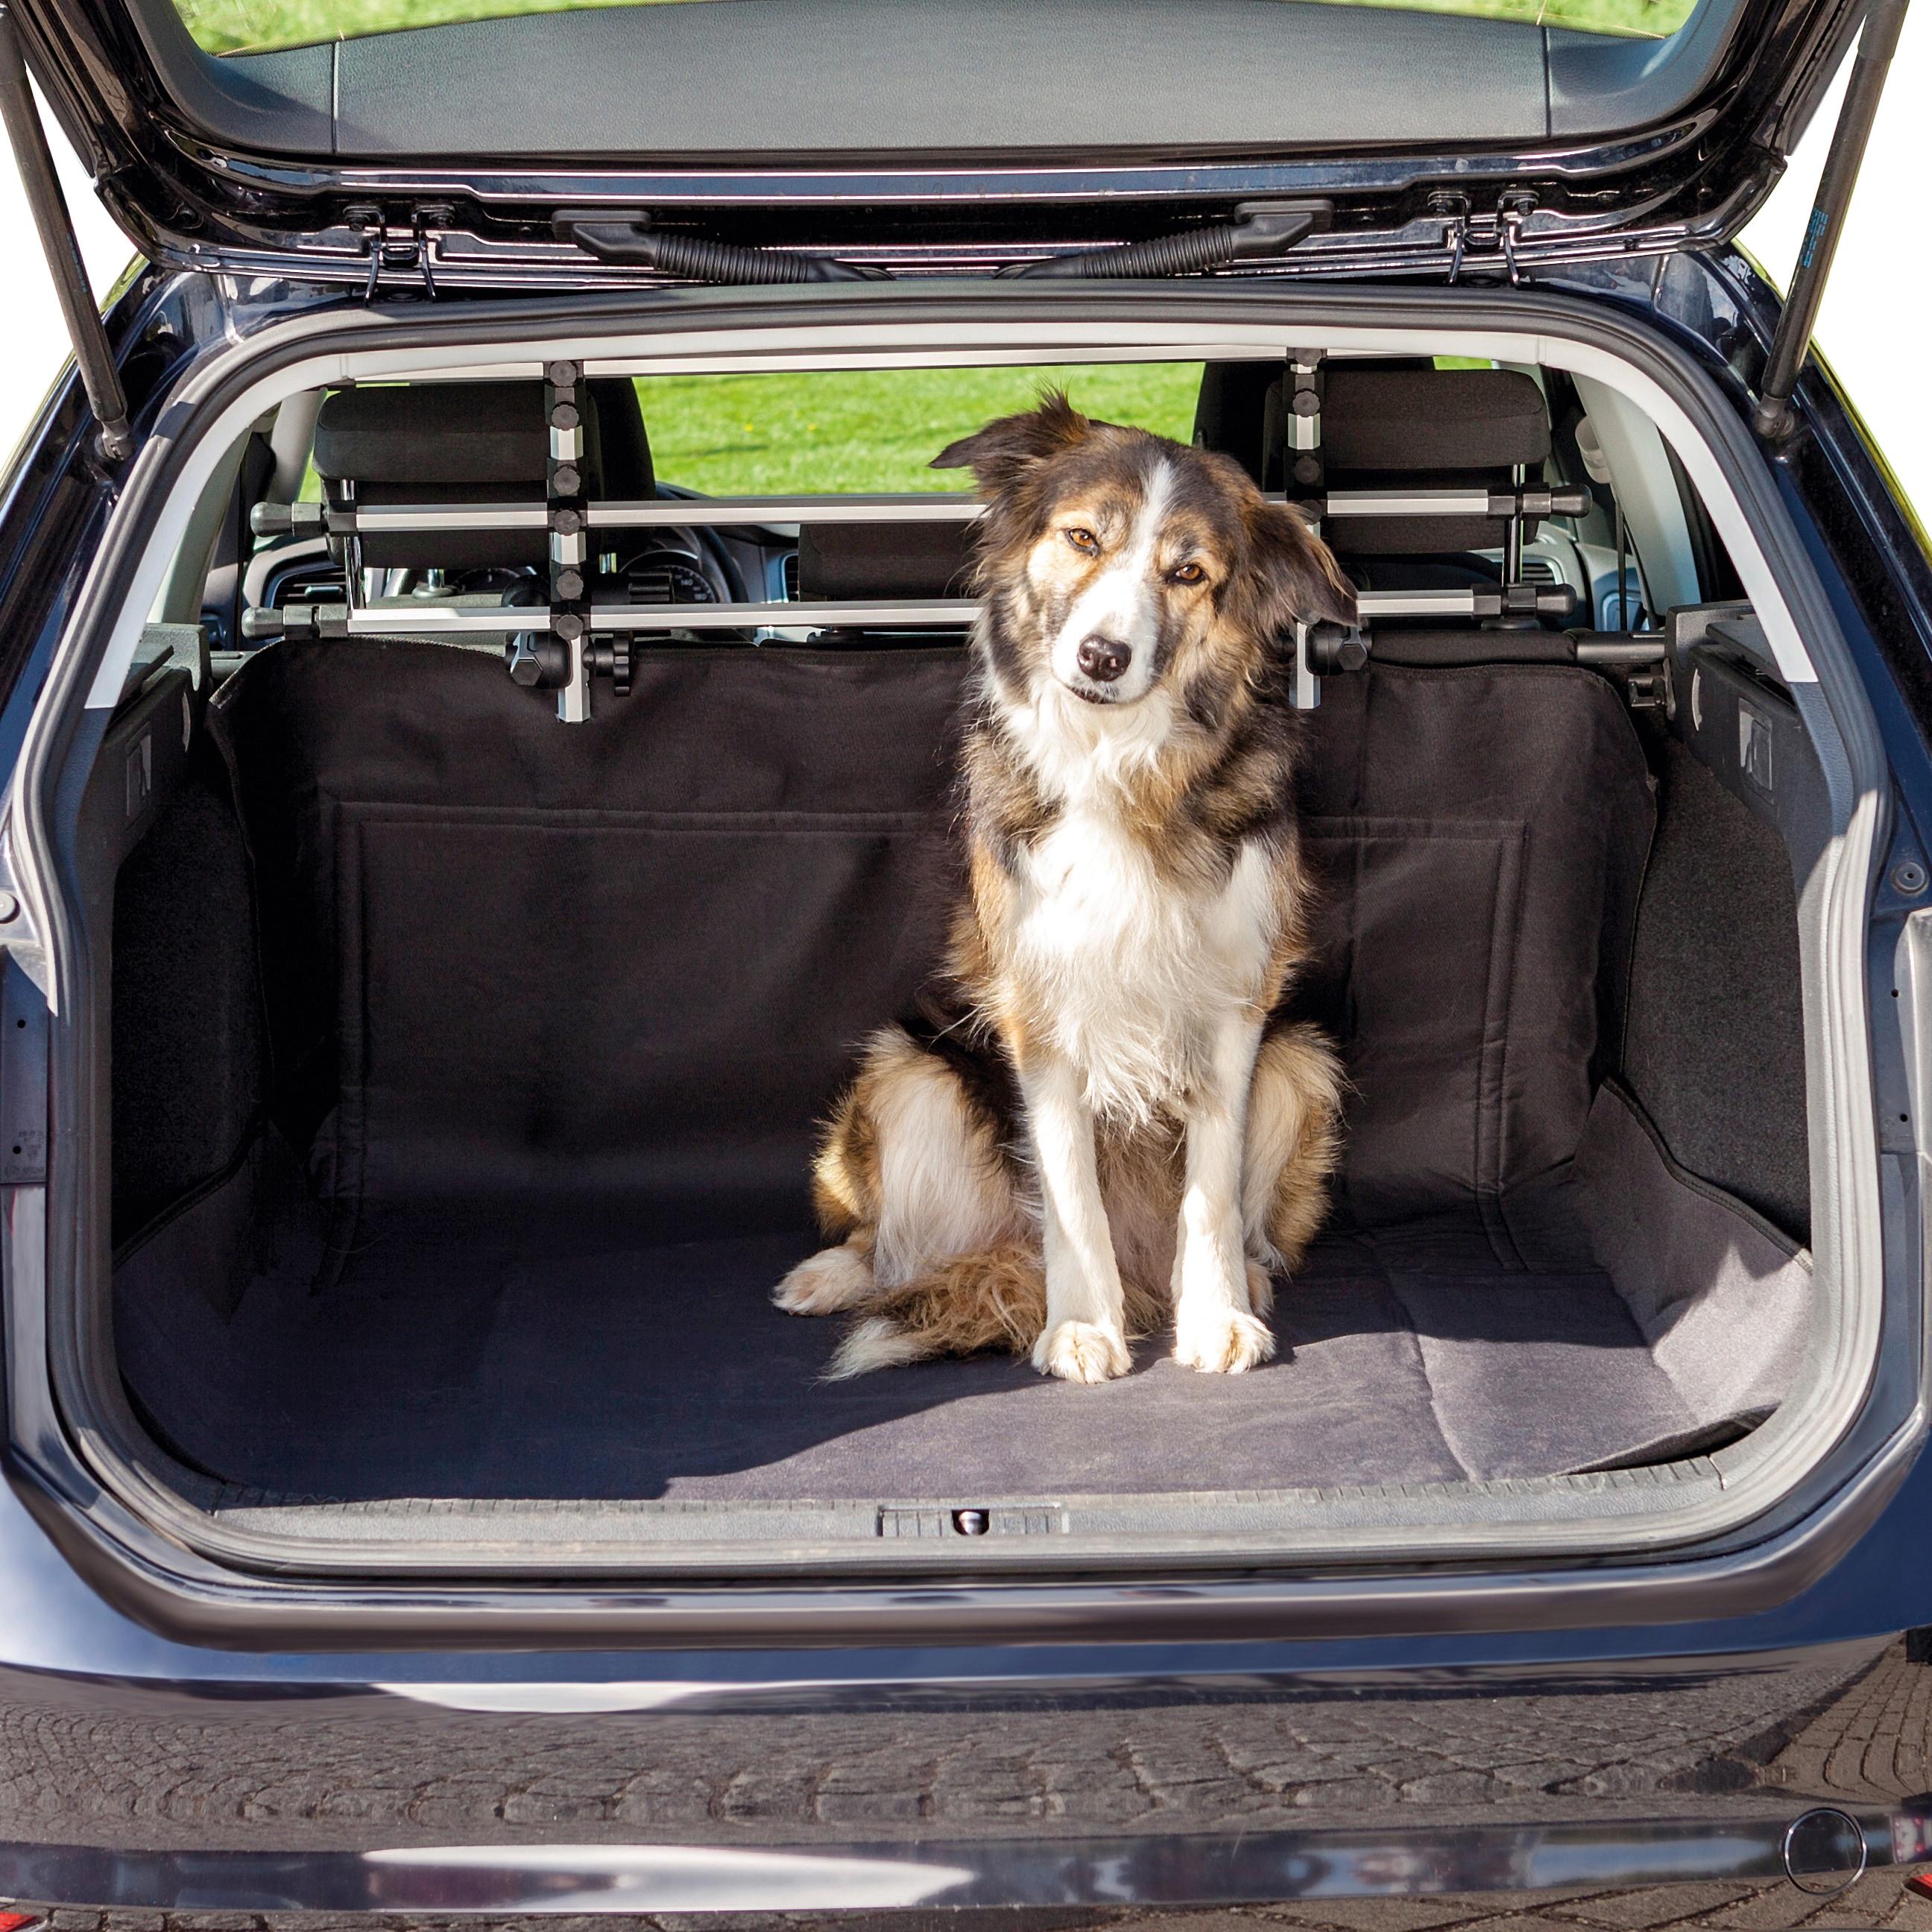 TRIXIE Tier-Kofferraumdecke, BxL: 120x150 cm schwarz Tier-Kofferraumdecke Hundebetten -decken Hund Tierbedarf